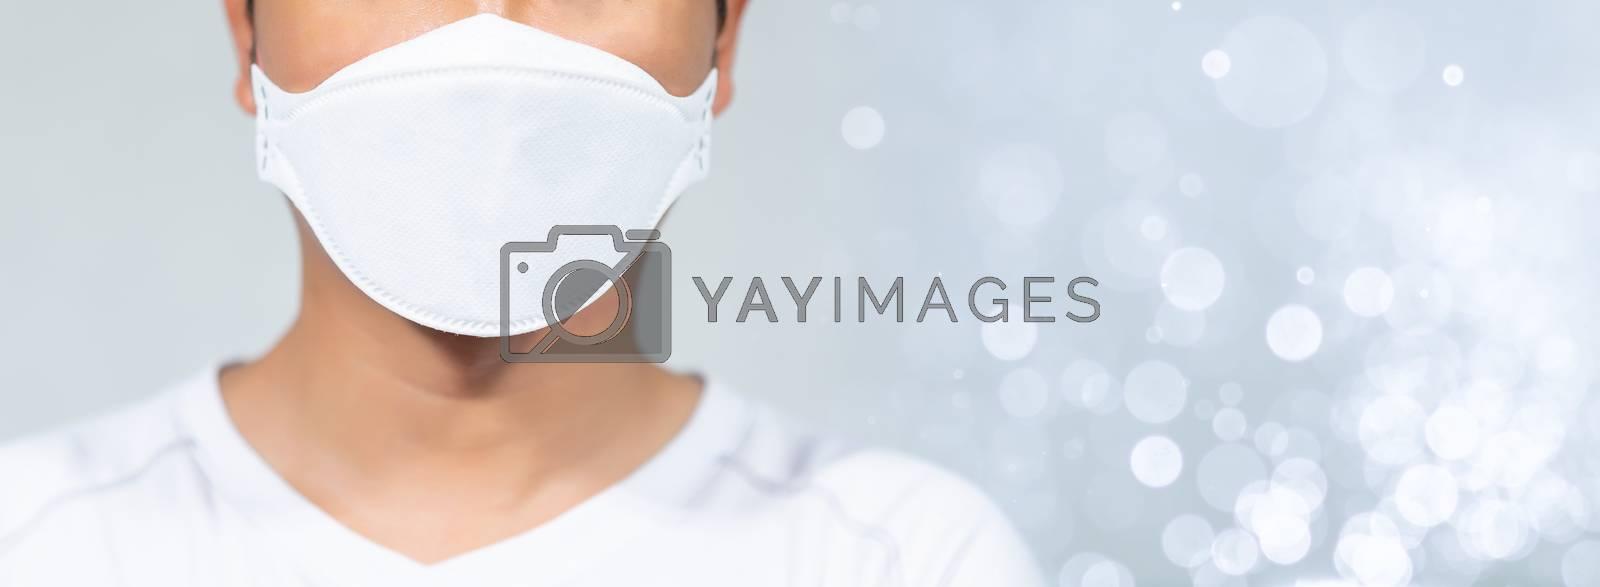 Men wearing masks to protect the coronavirus covid-19